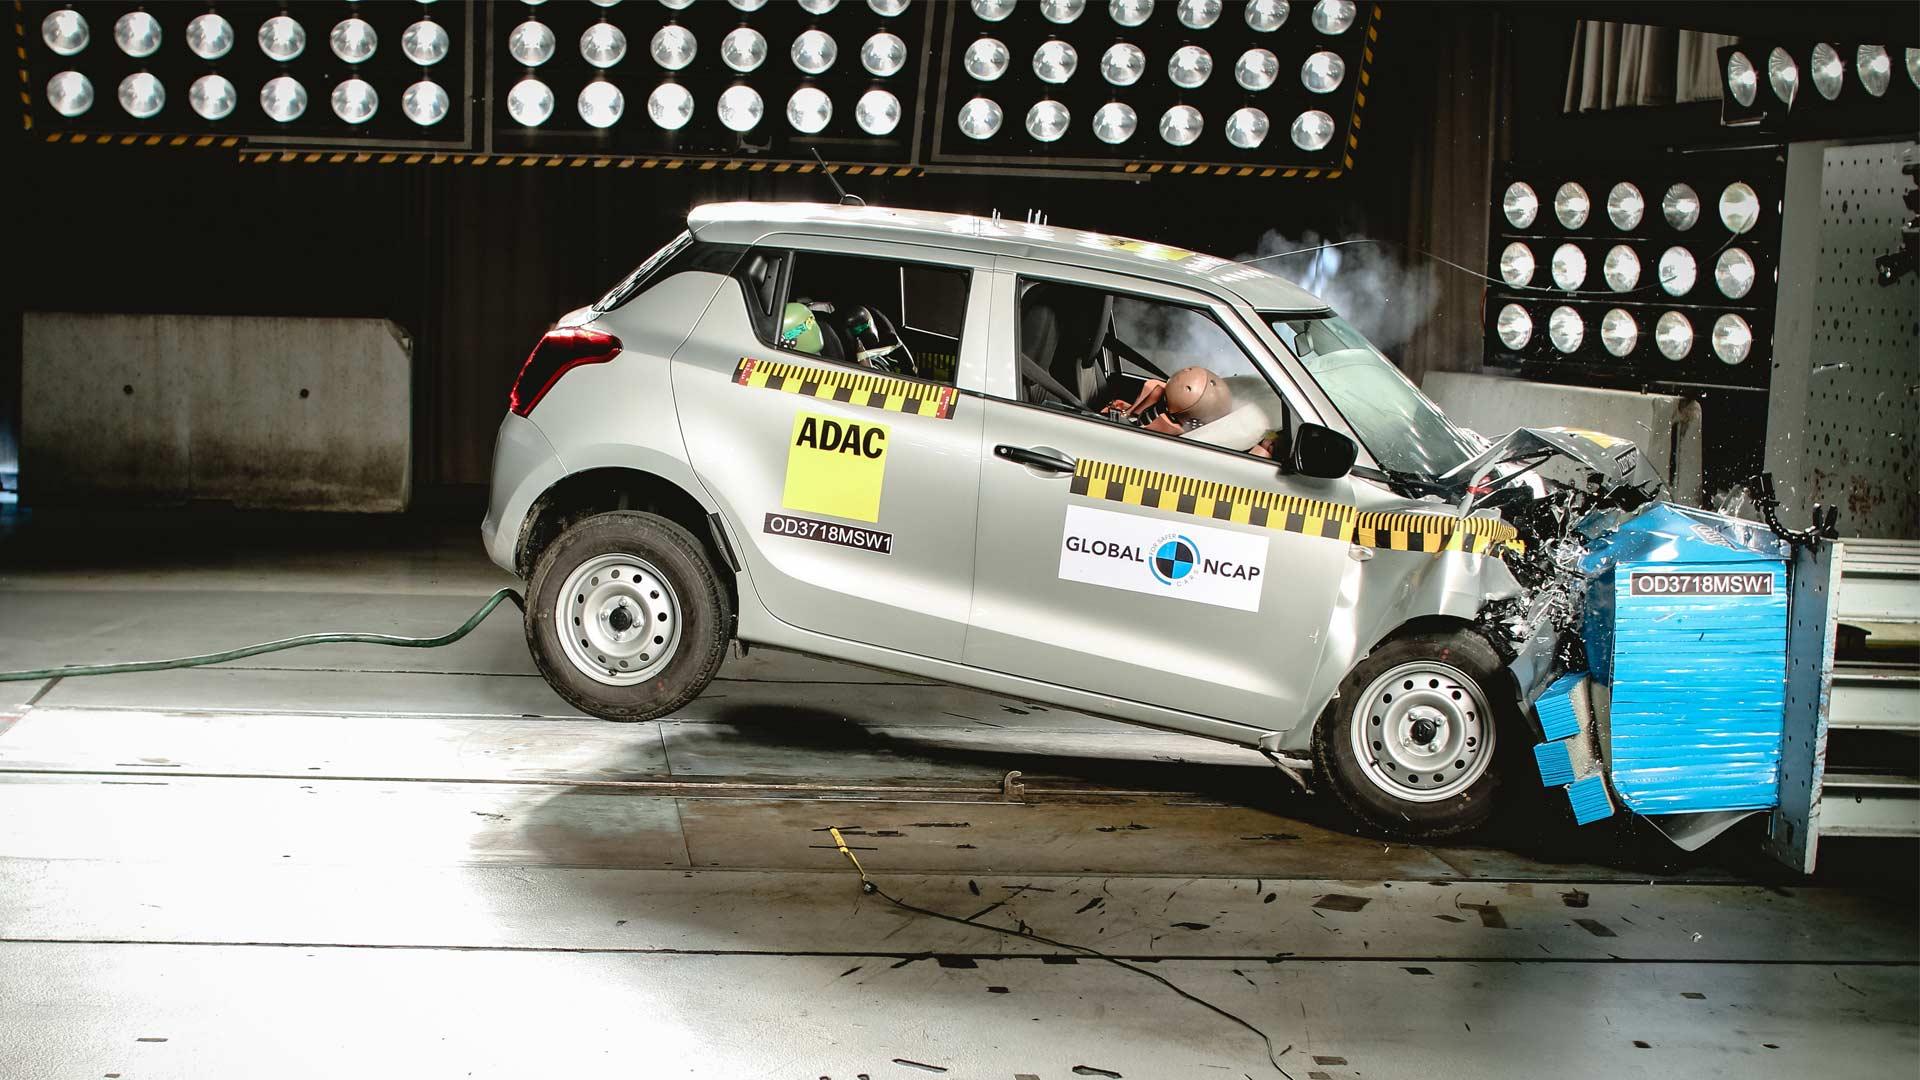 Maruti-Suzuki-Swift-Global-NCAP